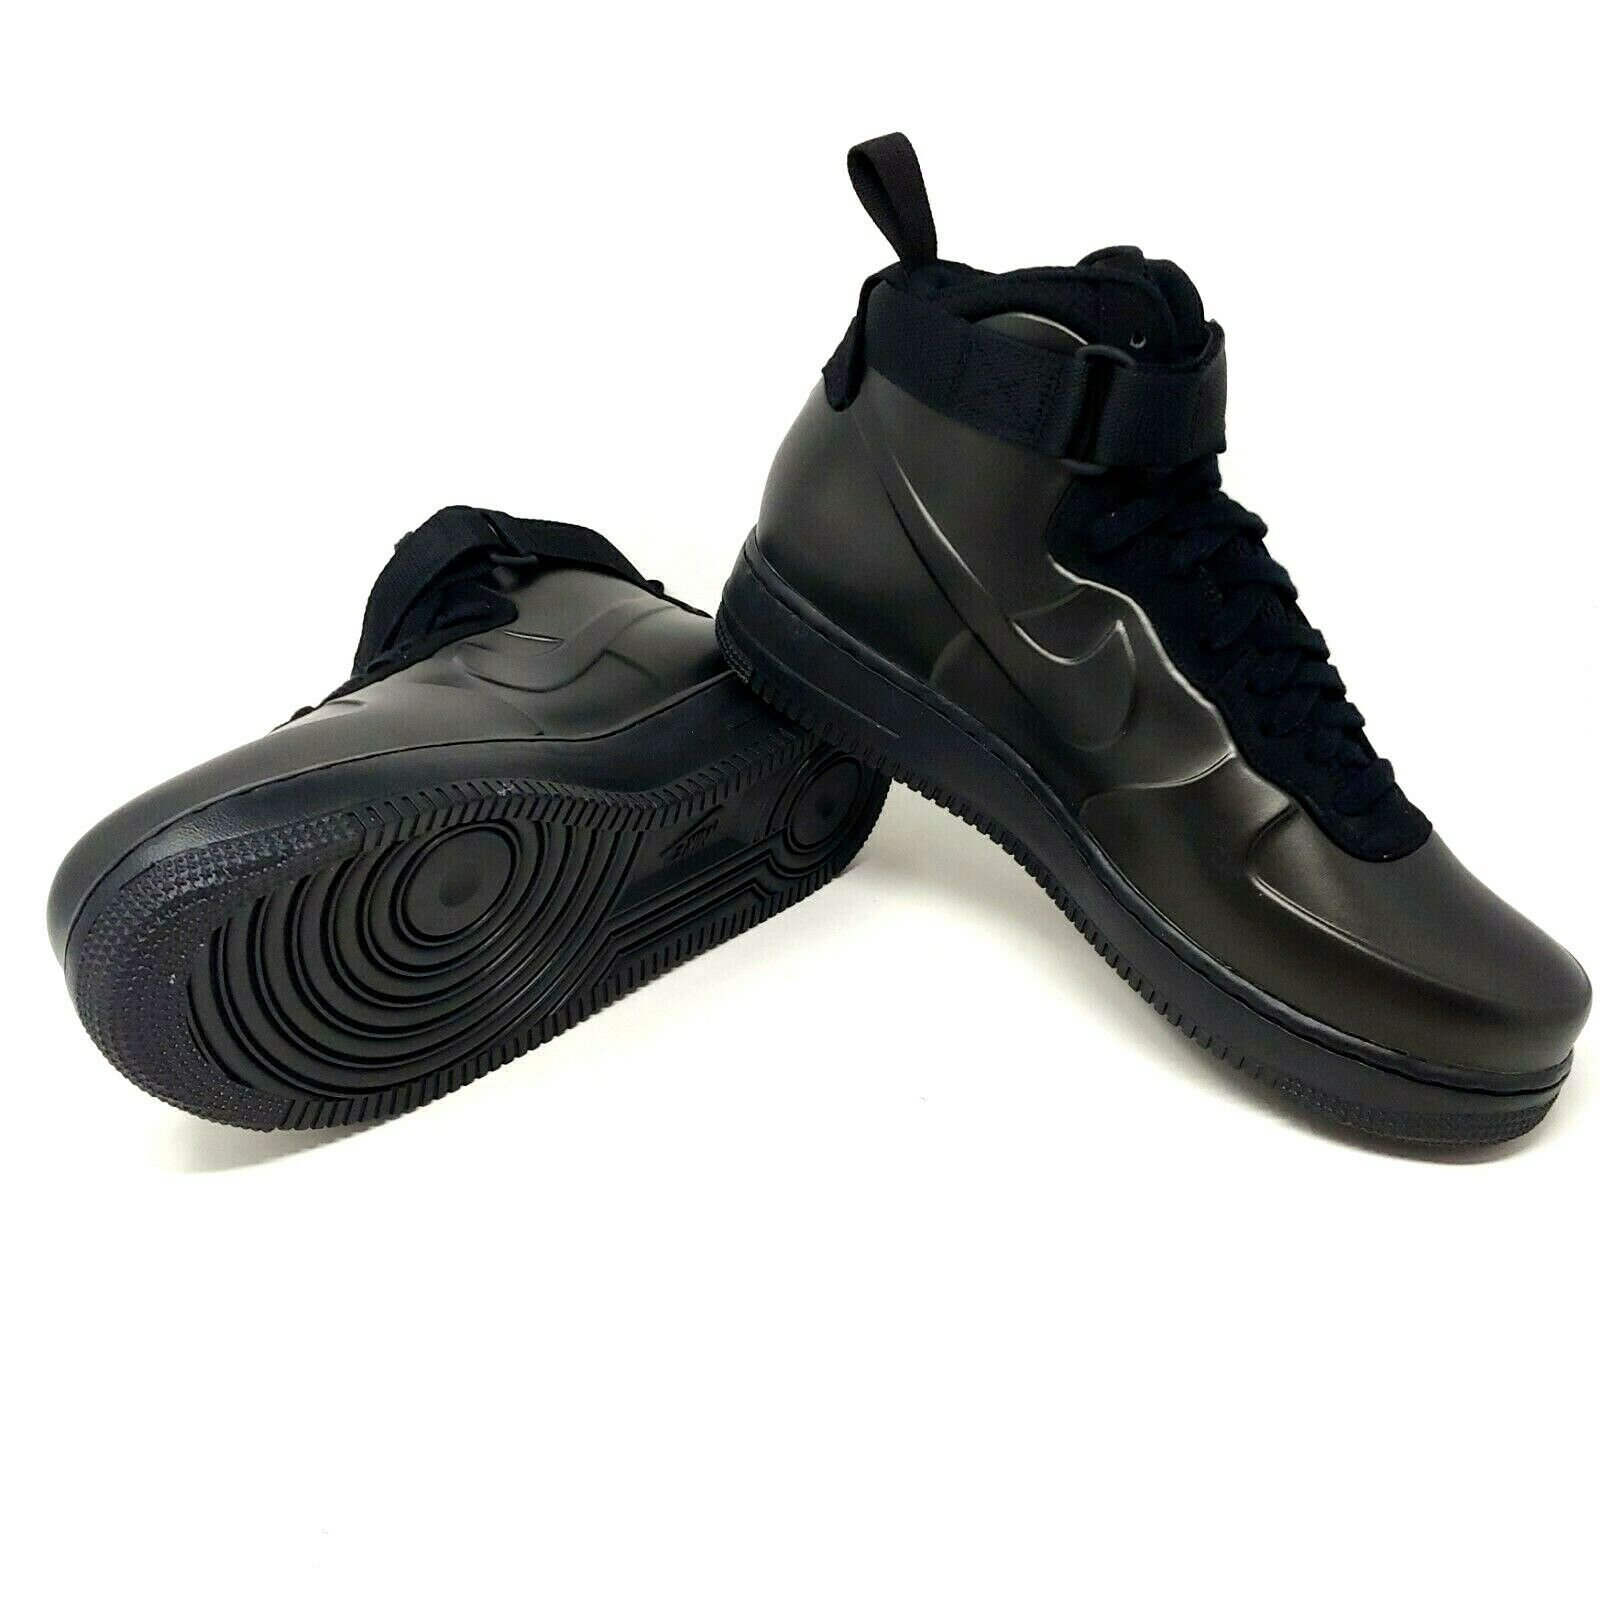 Copa Foamposite Force Air Nike de 1 Hombre 200 Msrp